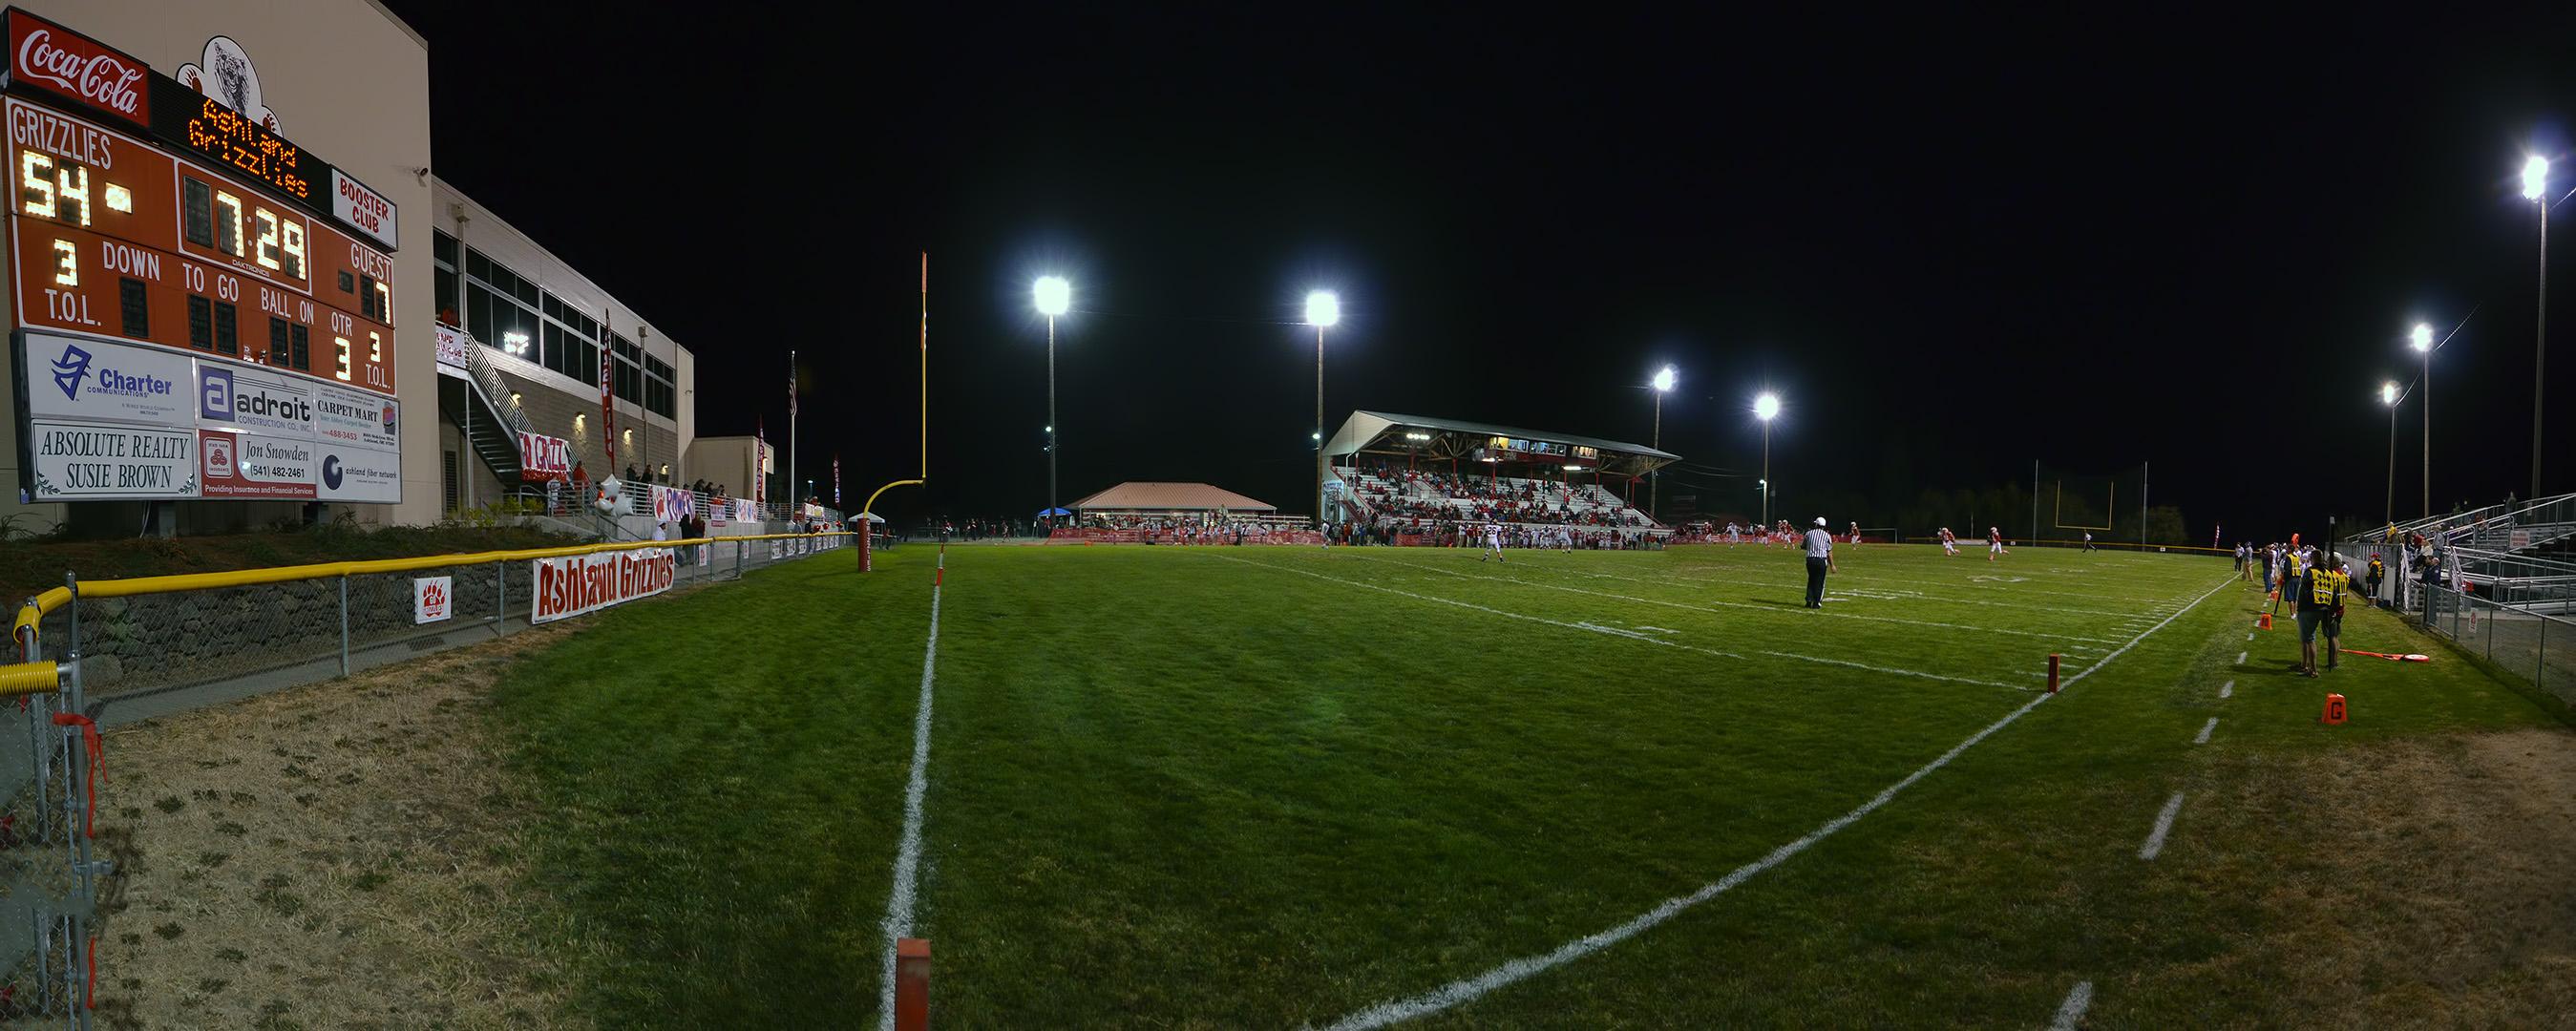 Football Stadium Lights Background